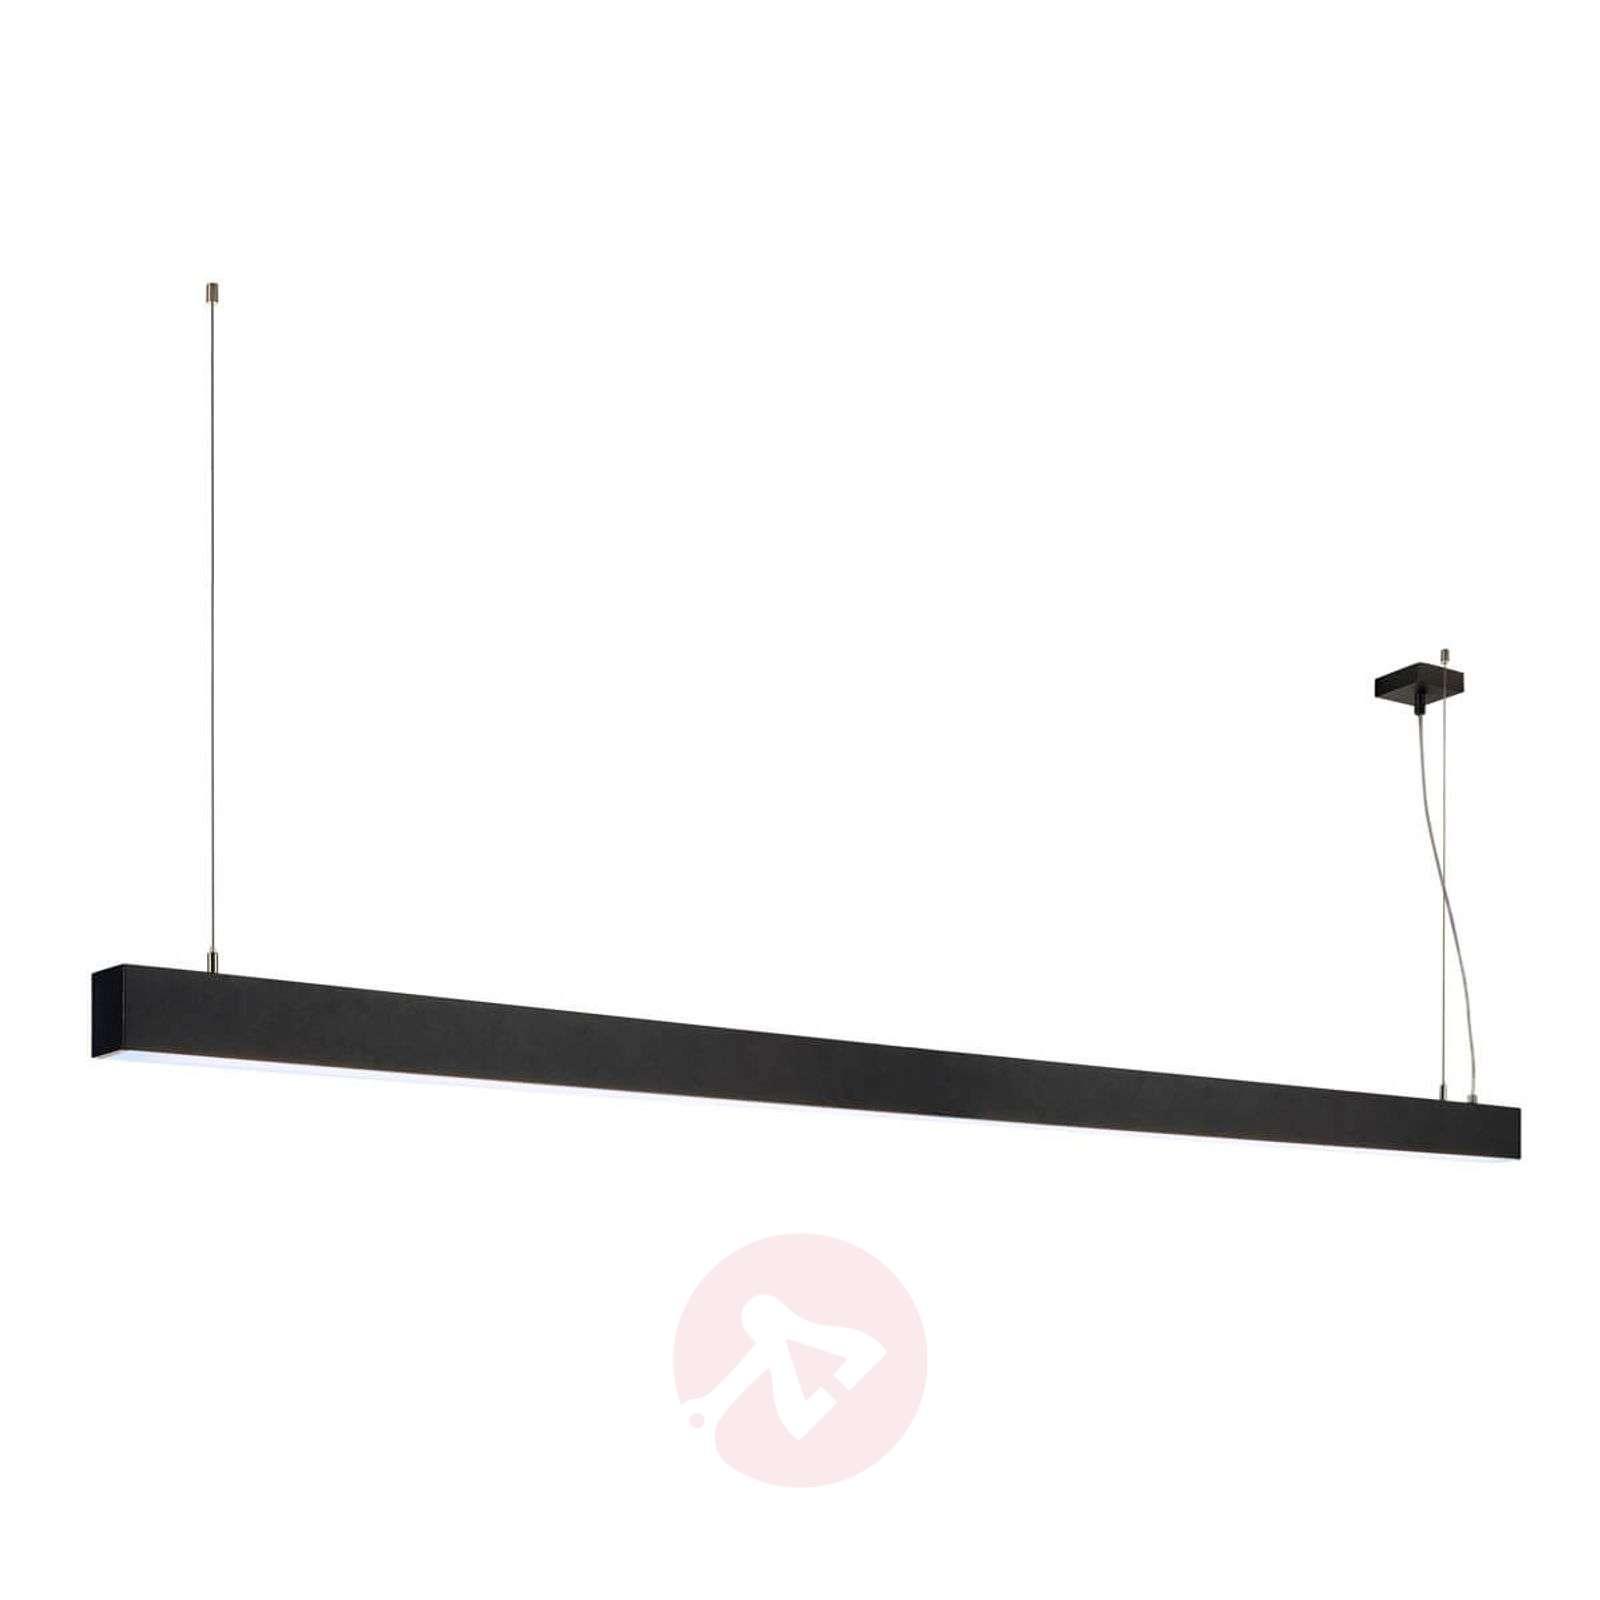 Pitkä LED-riippuvalaisin Glenos 200,5 cm musta-5504750-01